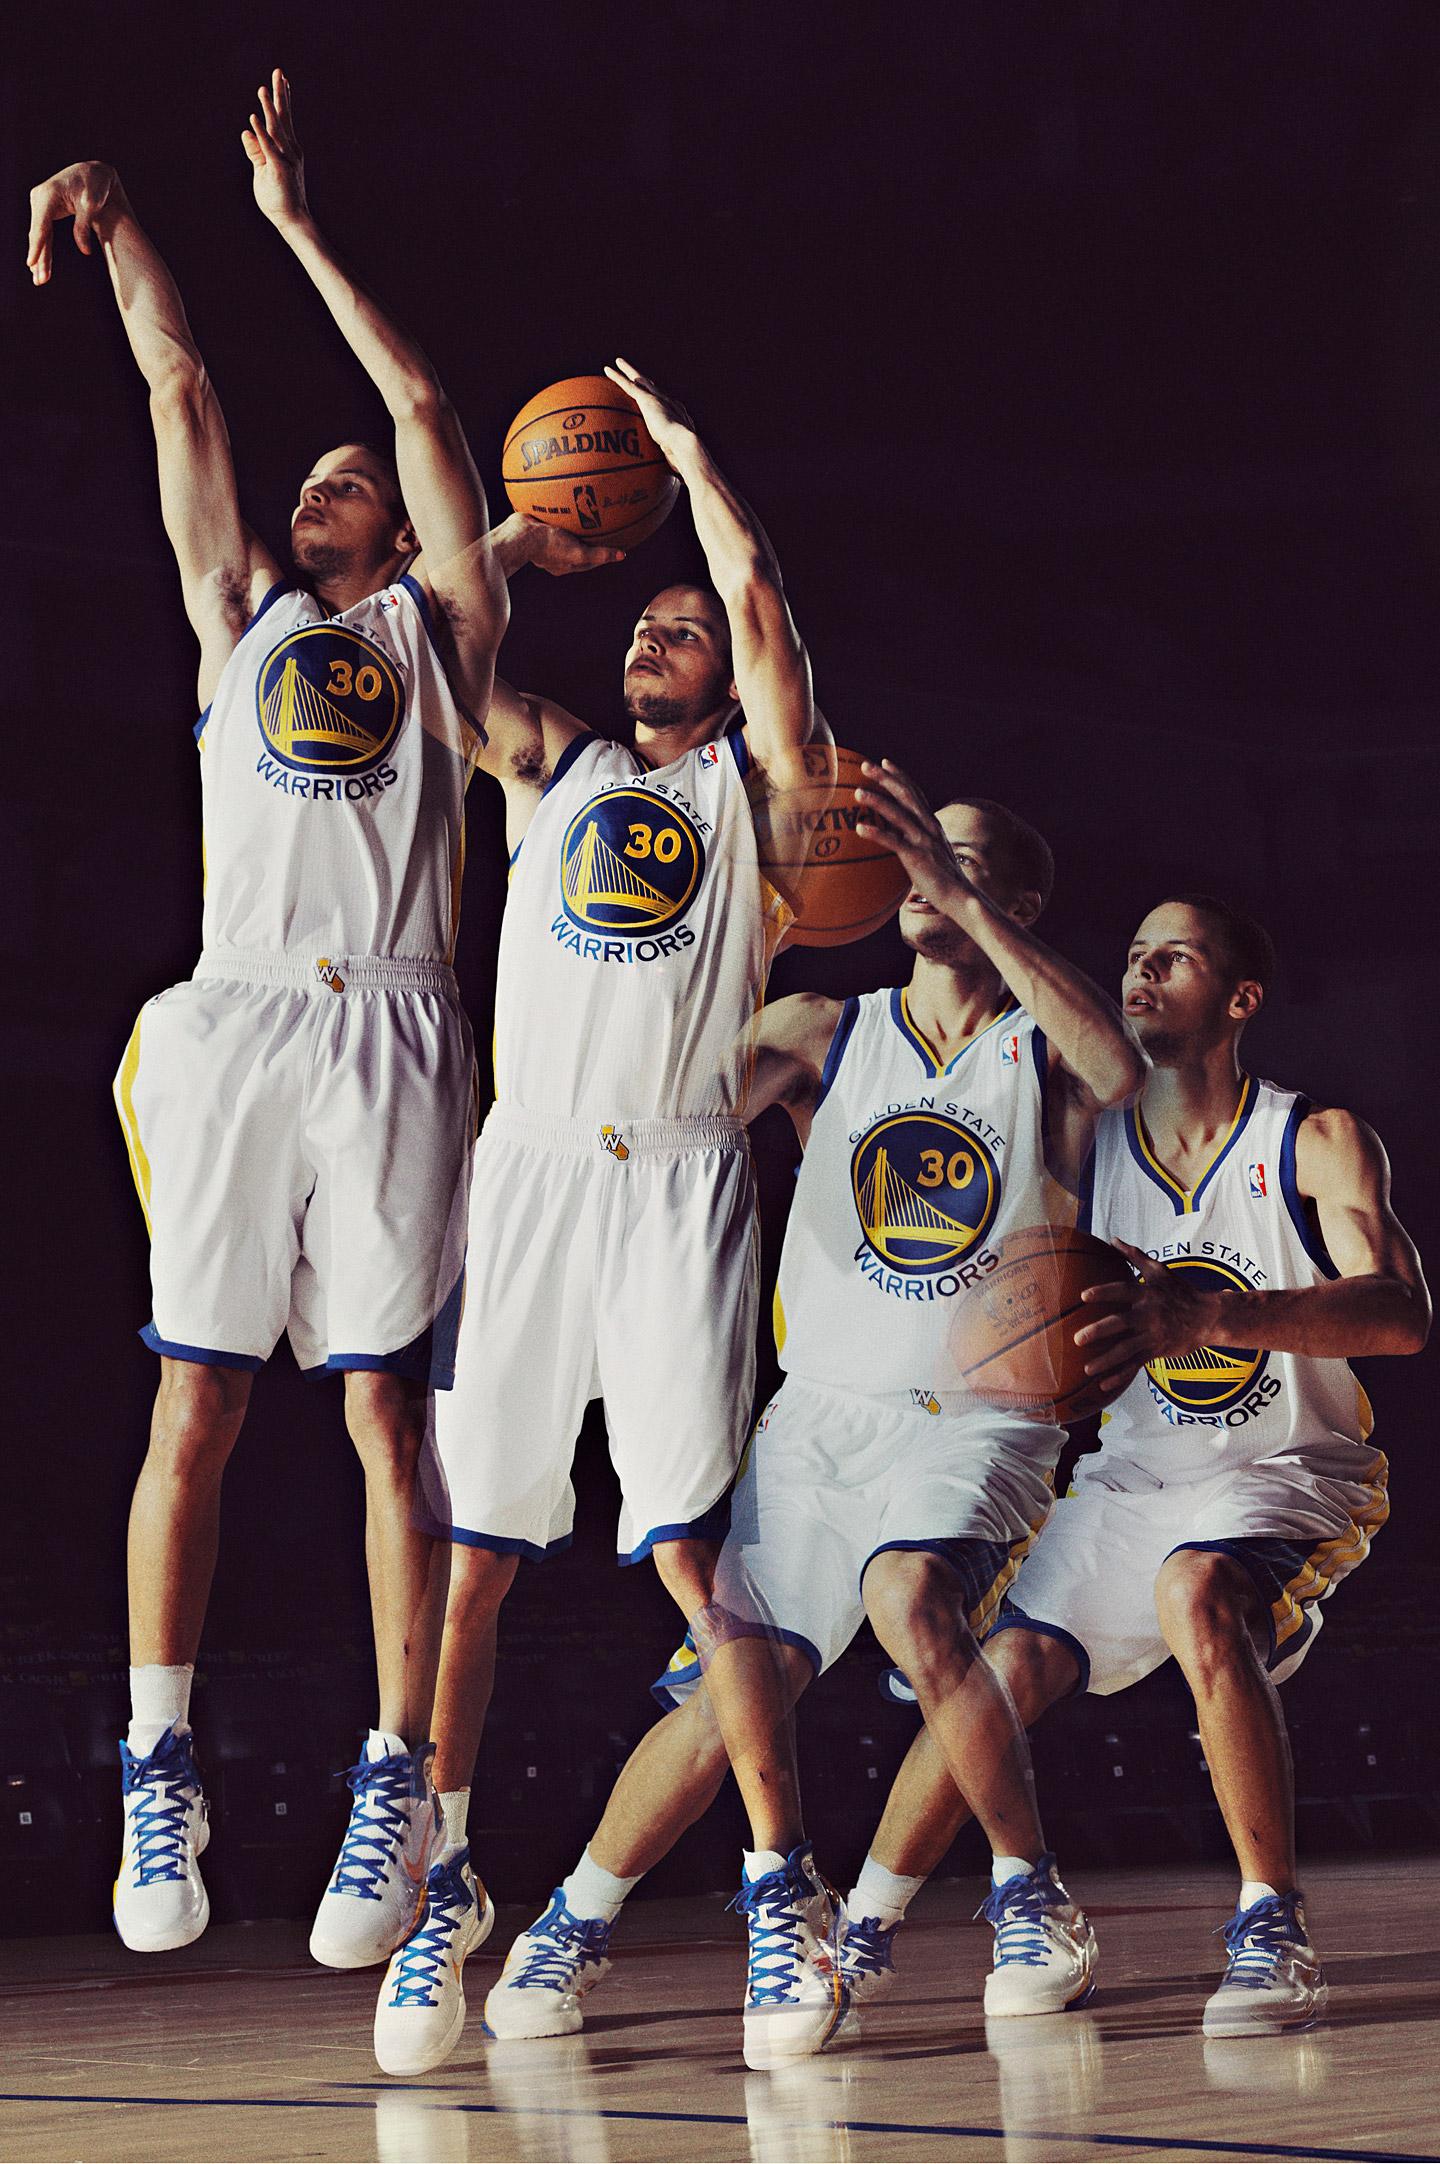 Best mechanics in sports: Jump shot by Stephen Curry, Golden State Warriors